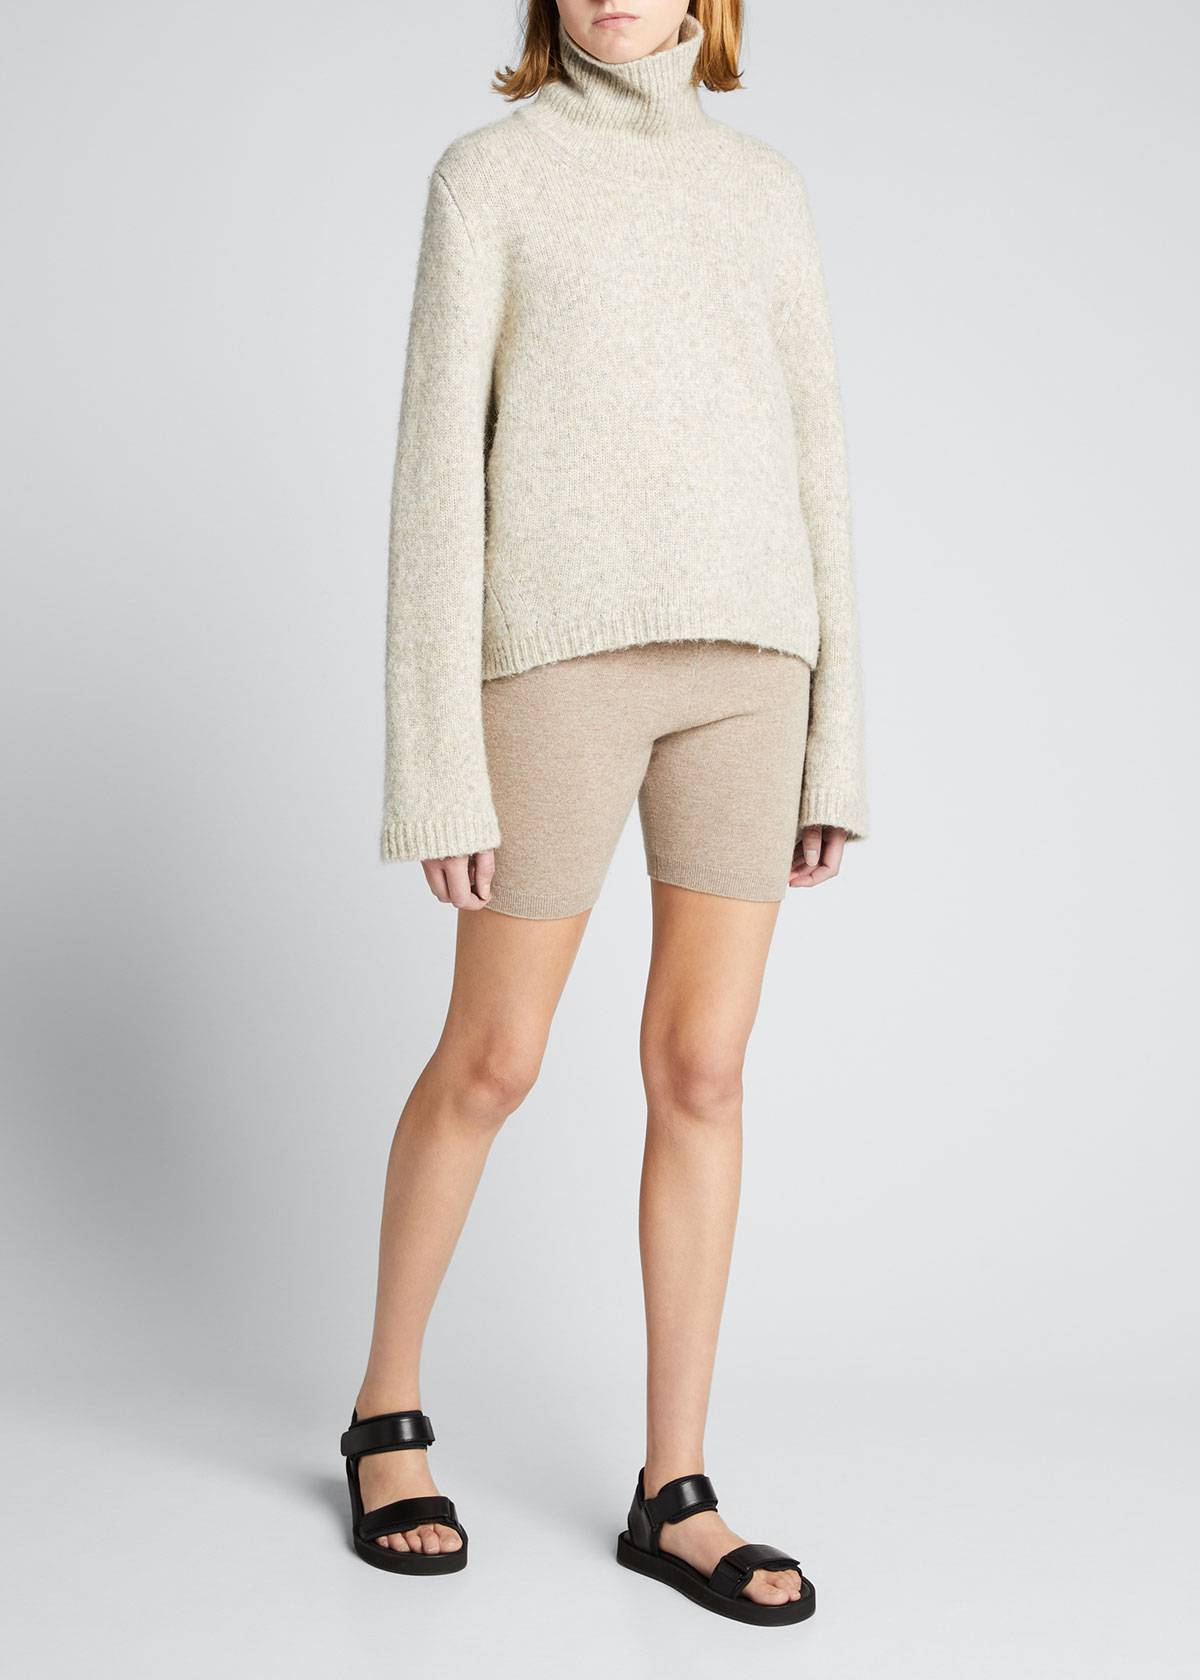 FRAME Cashmere Bike Shorts  - female - MUSHROOM HEATHER - Size: Small